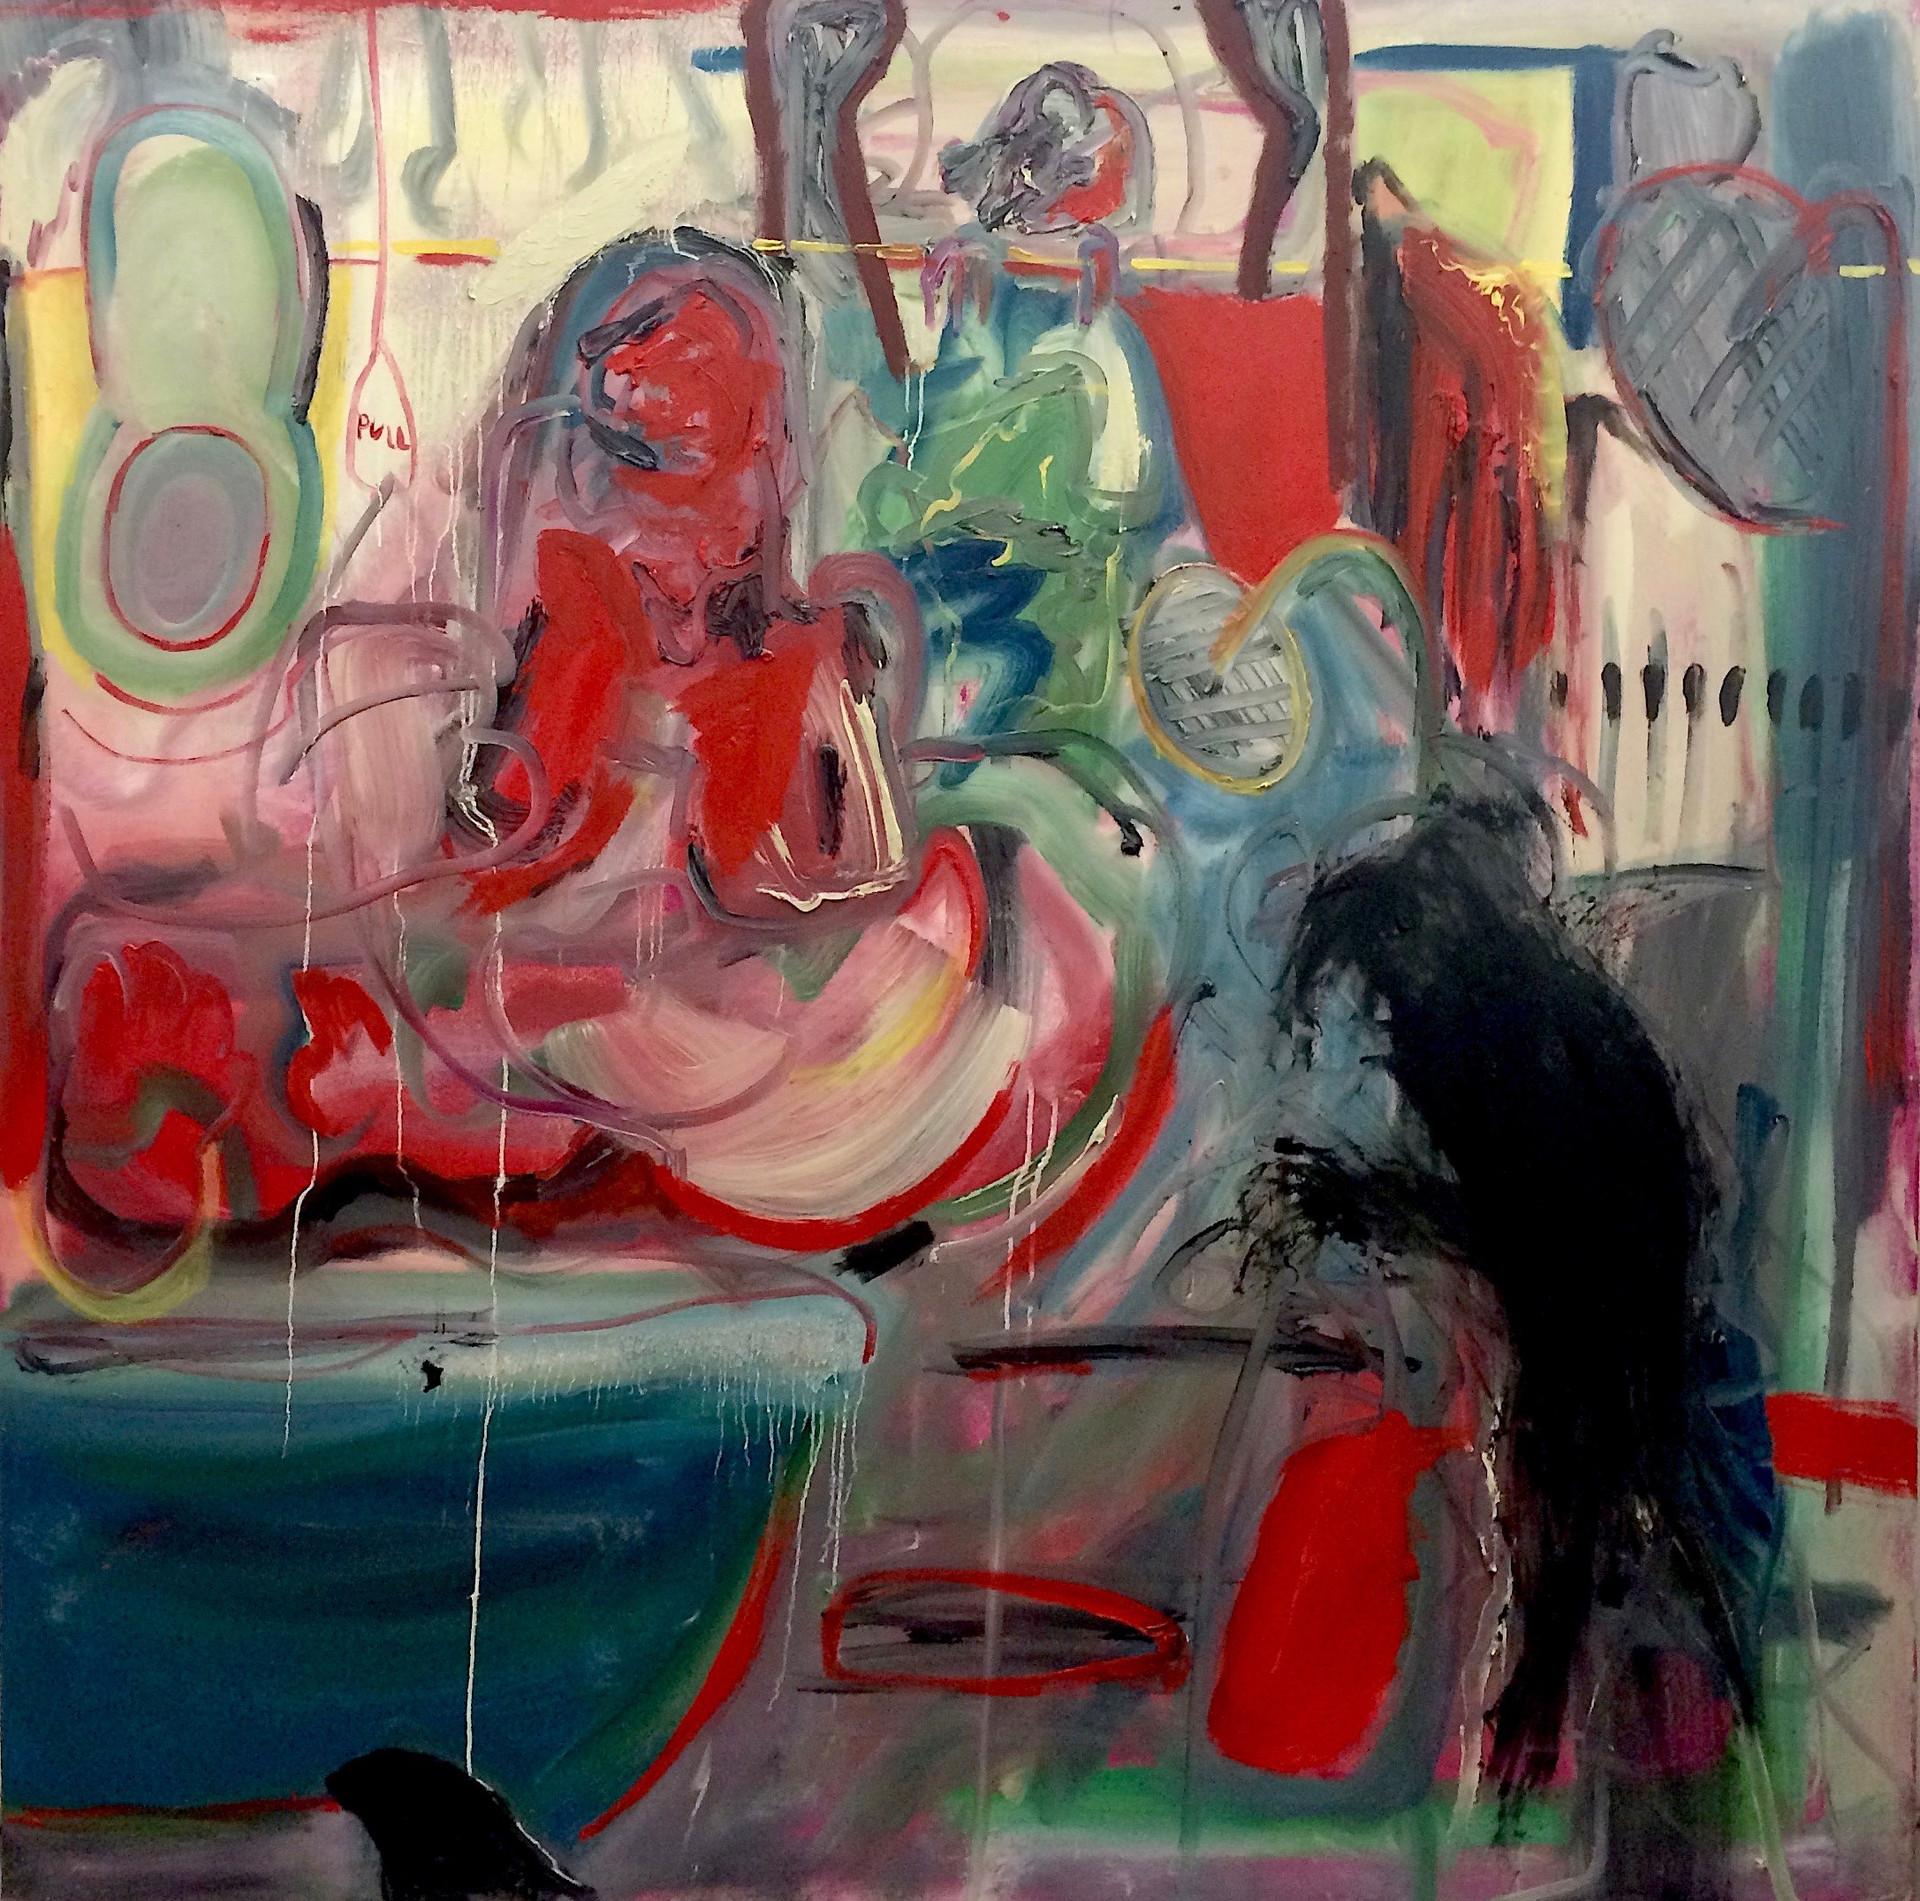 Spring Clean, 2018, oil on canvas, 148 x 148 cm